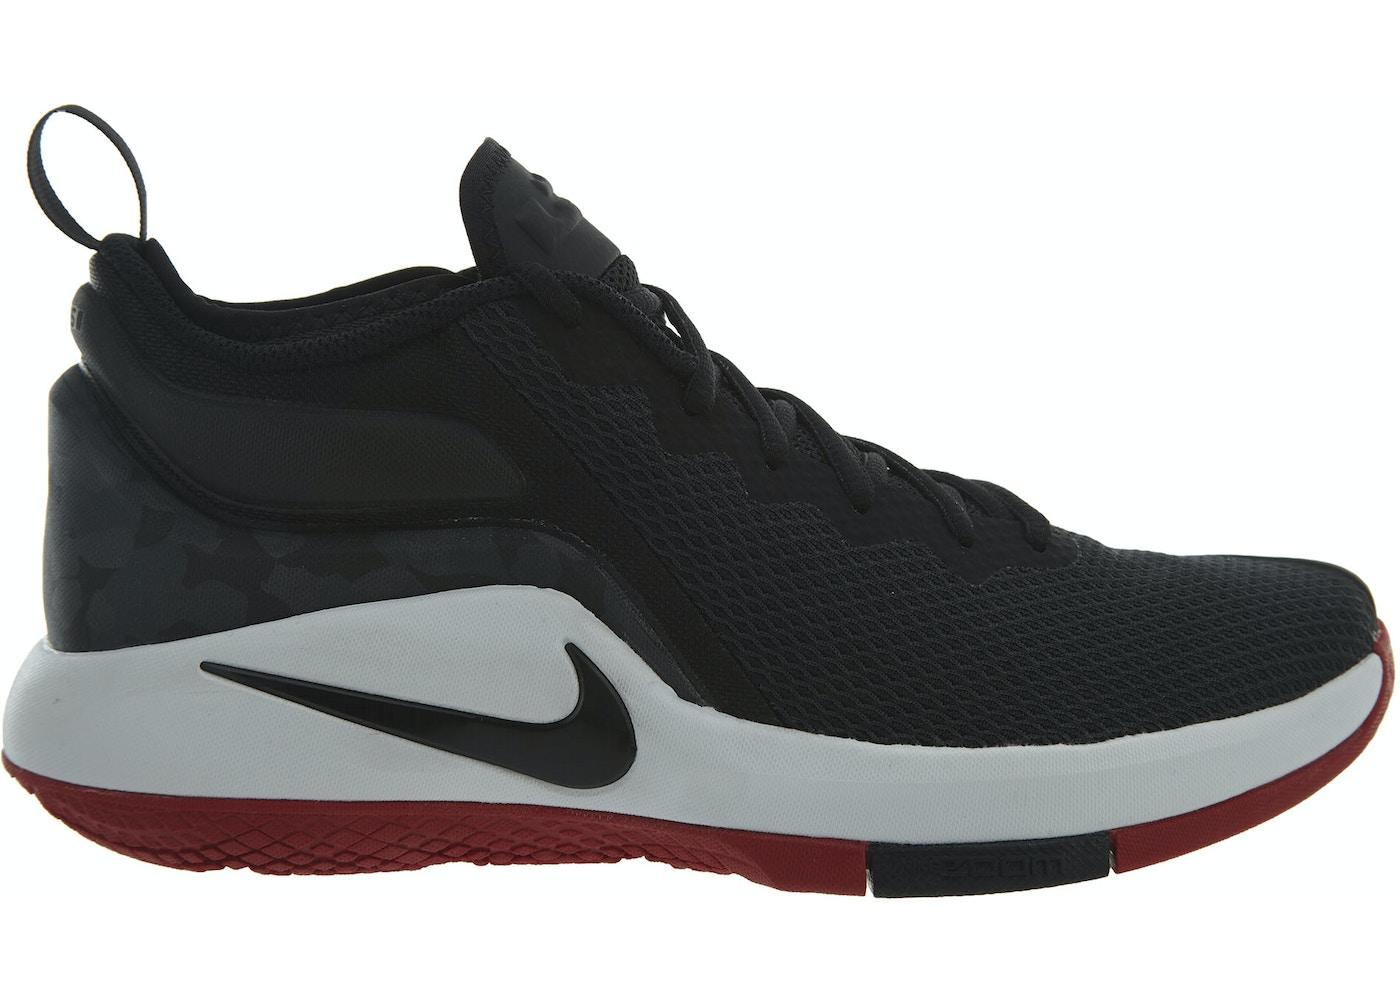 sports shoes 77fb6 677c0 Nike Lebron Witness II Black Black-White-Gym Red - 942518-006